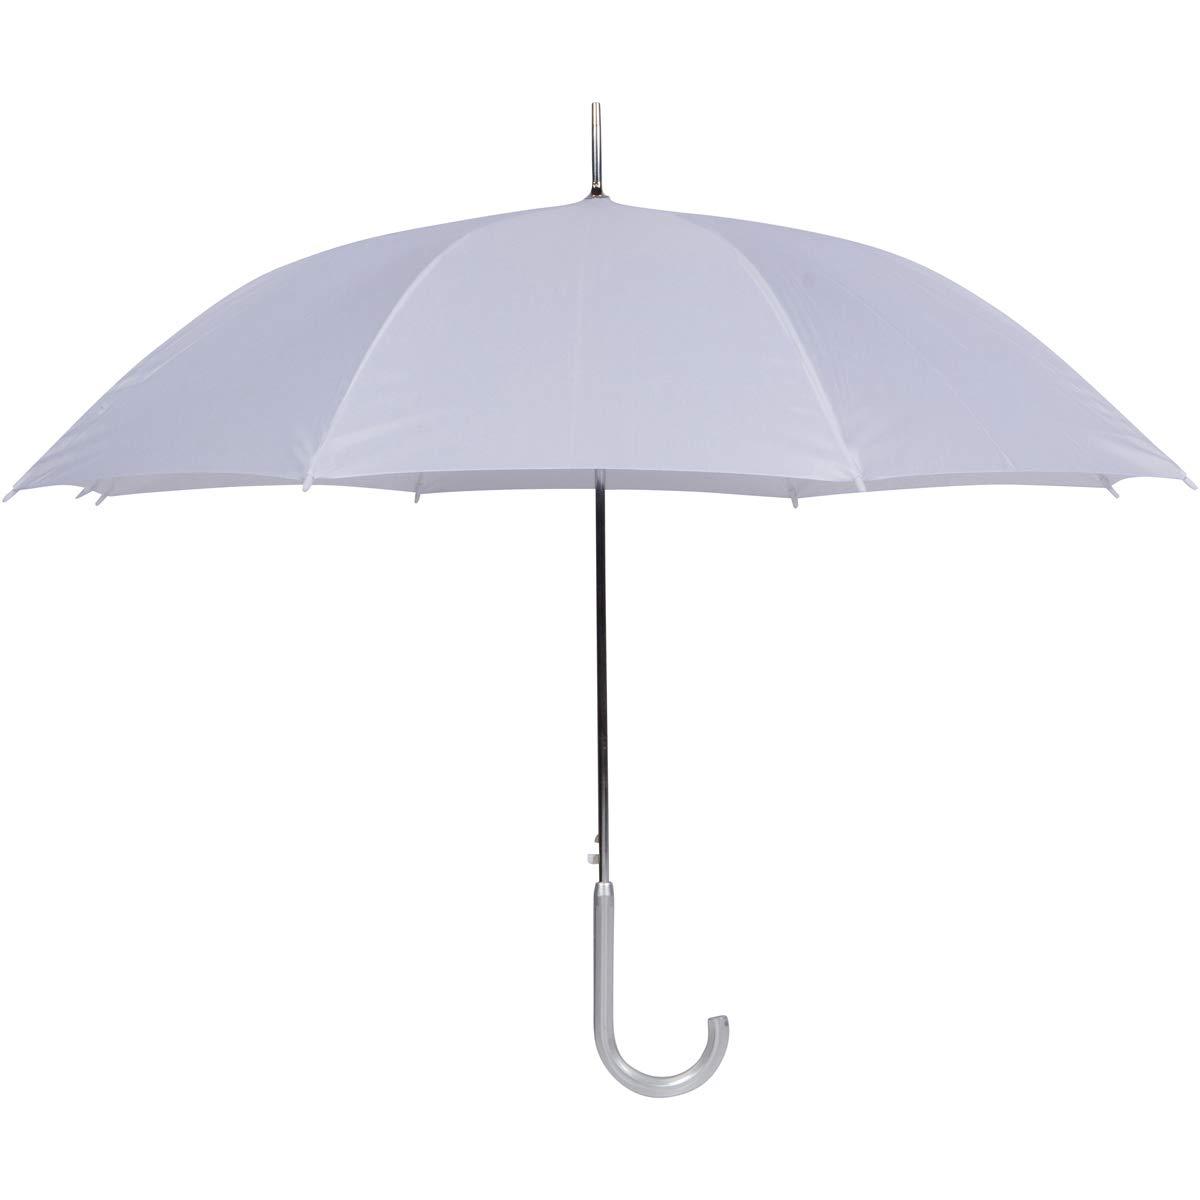 Cloak Wholesale Wedding Style Umbrellas (Case of 50, White)